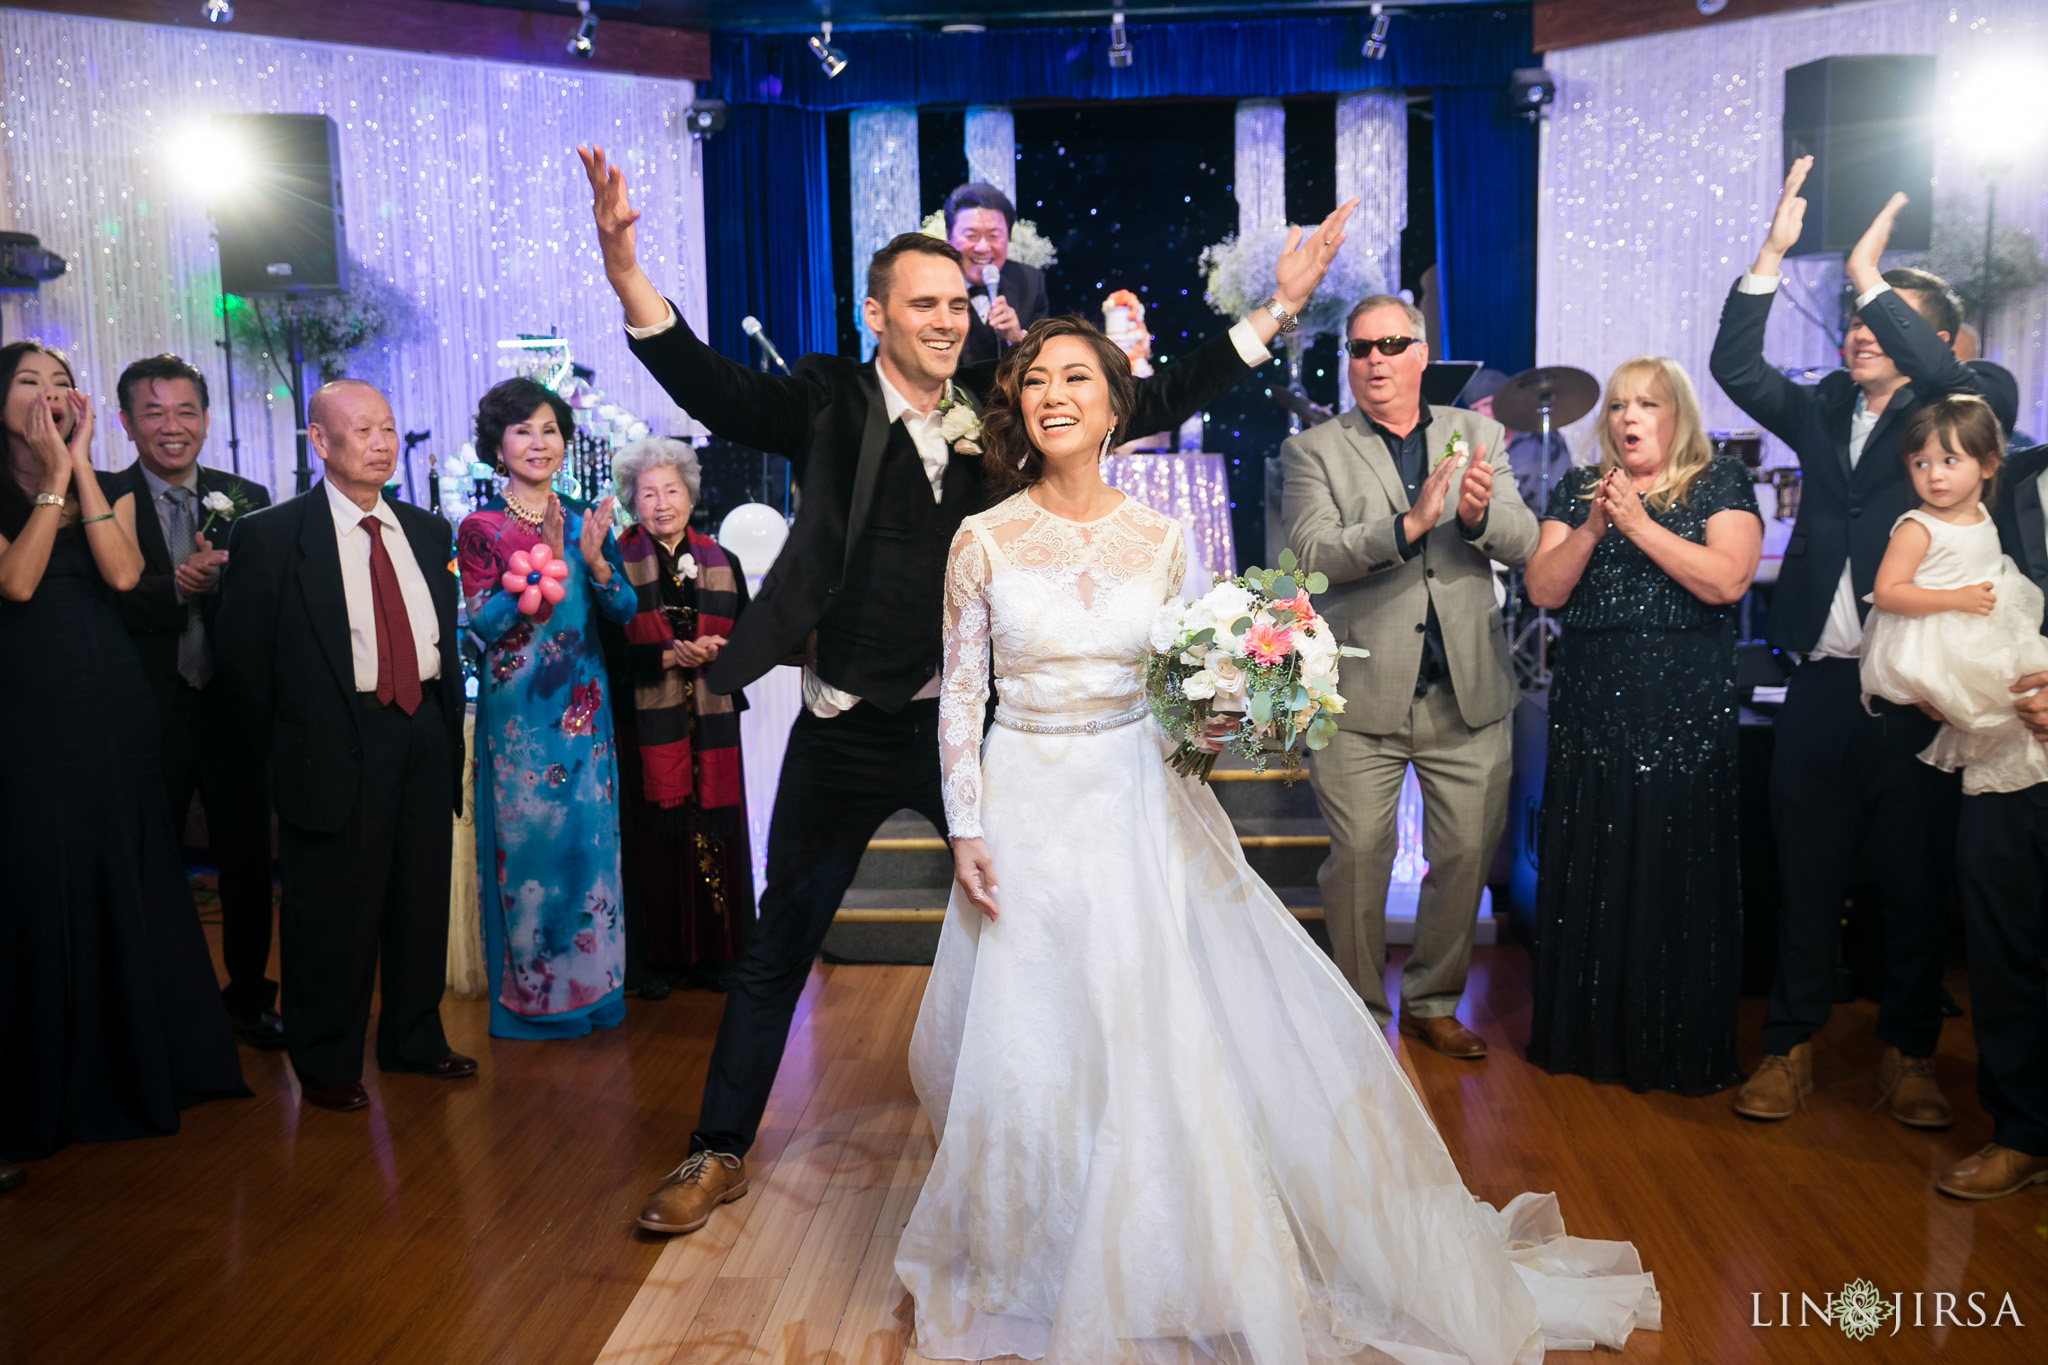 diamond seafood palace gardenss wedding lin and jirsa photography